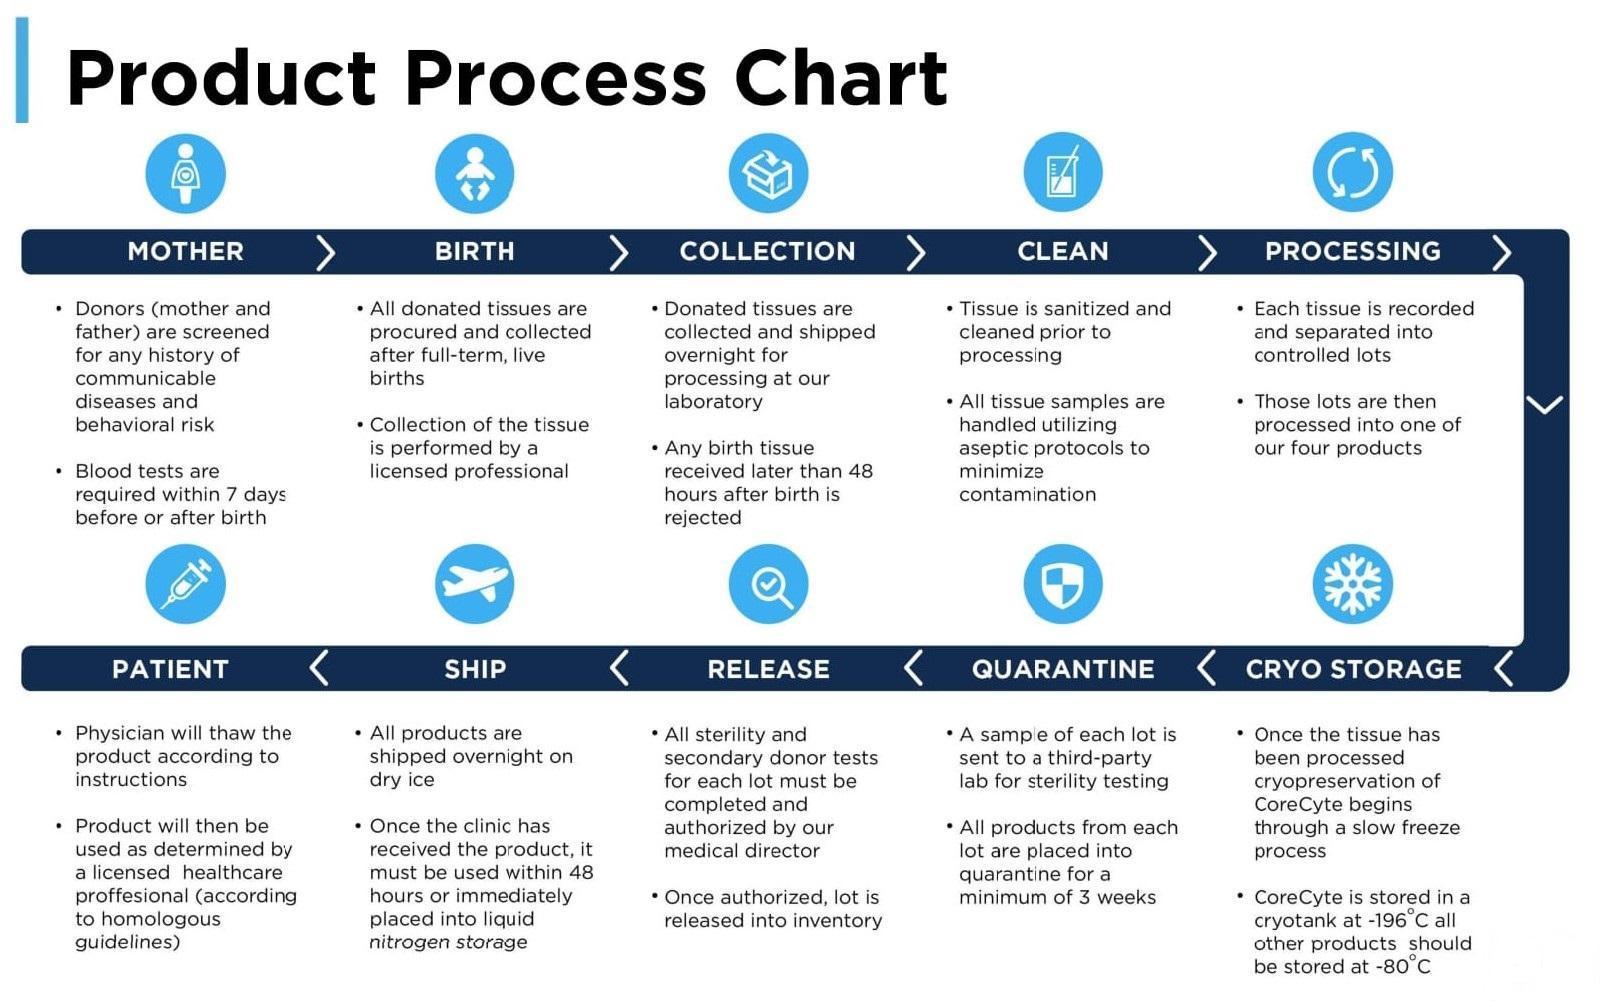 Product Process Chart